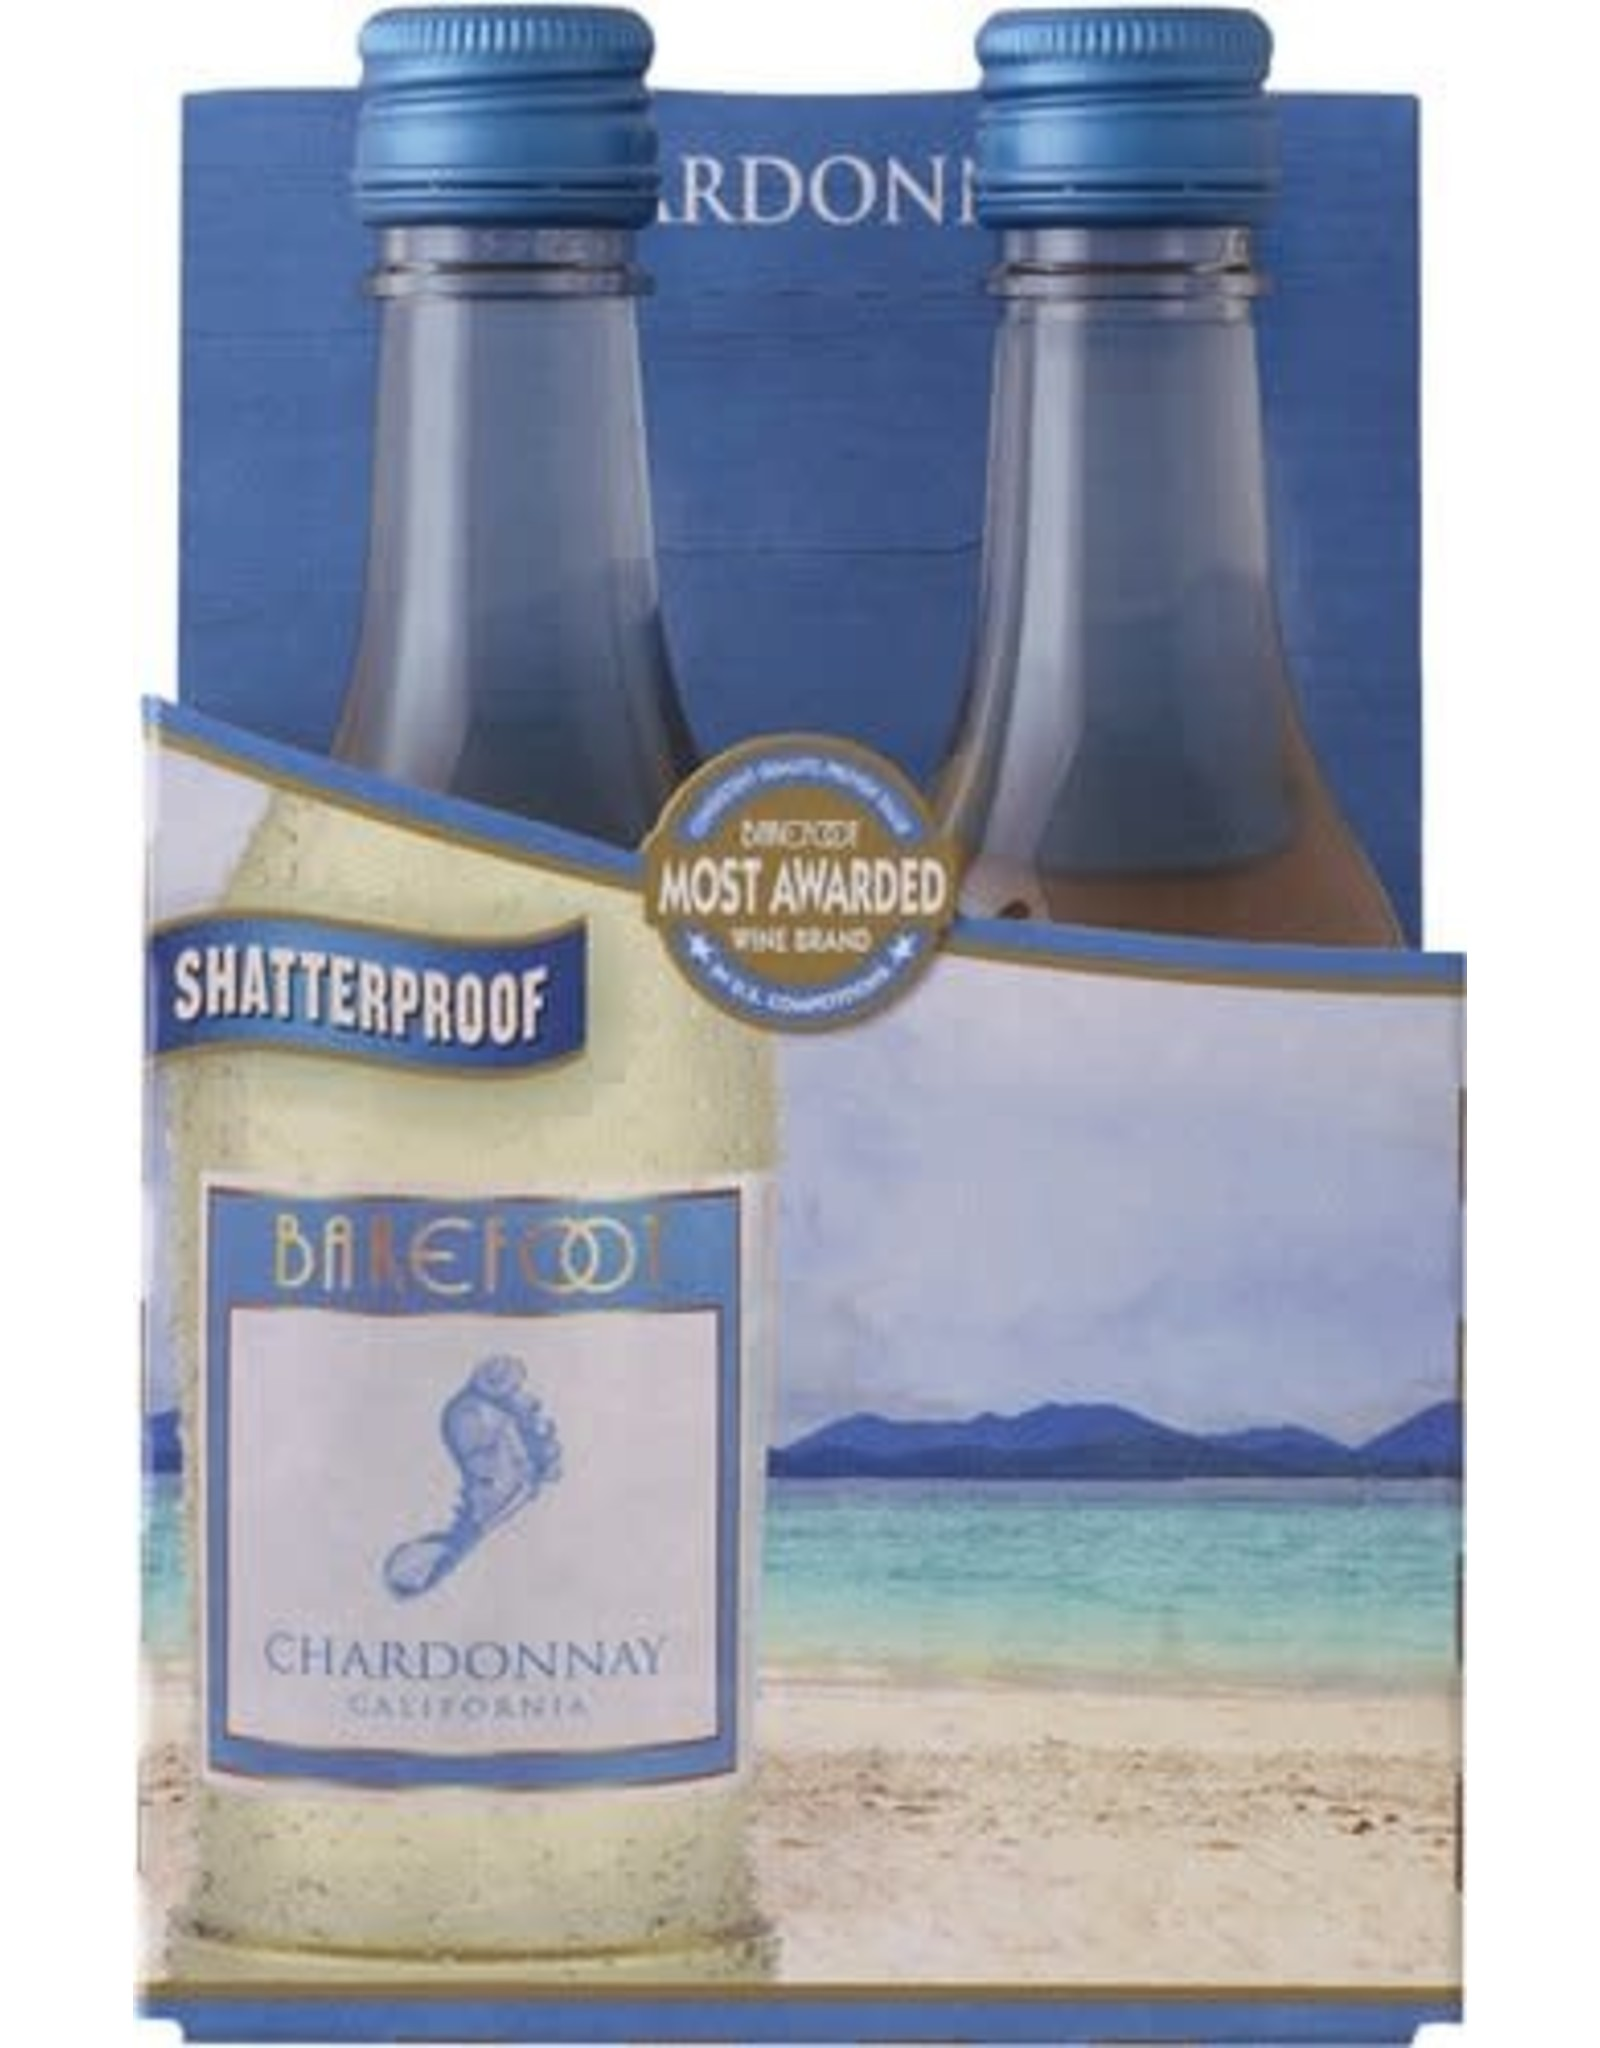 Barefoot Chardonnay 4pk